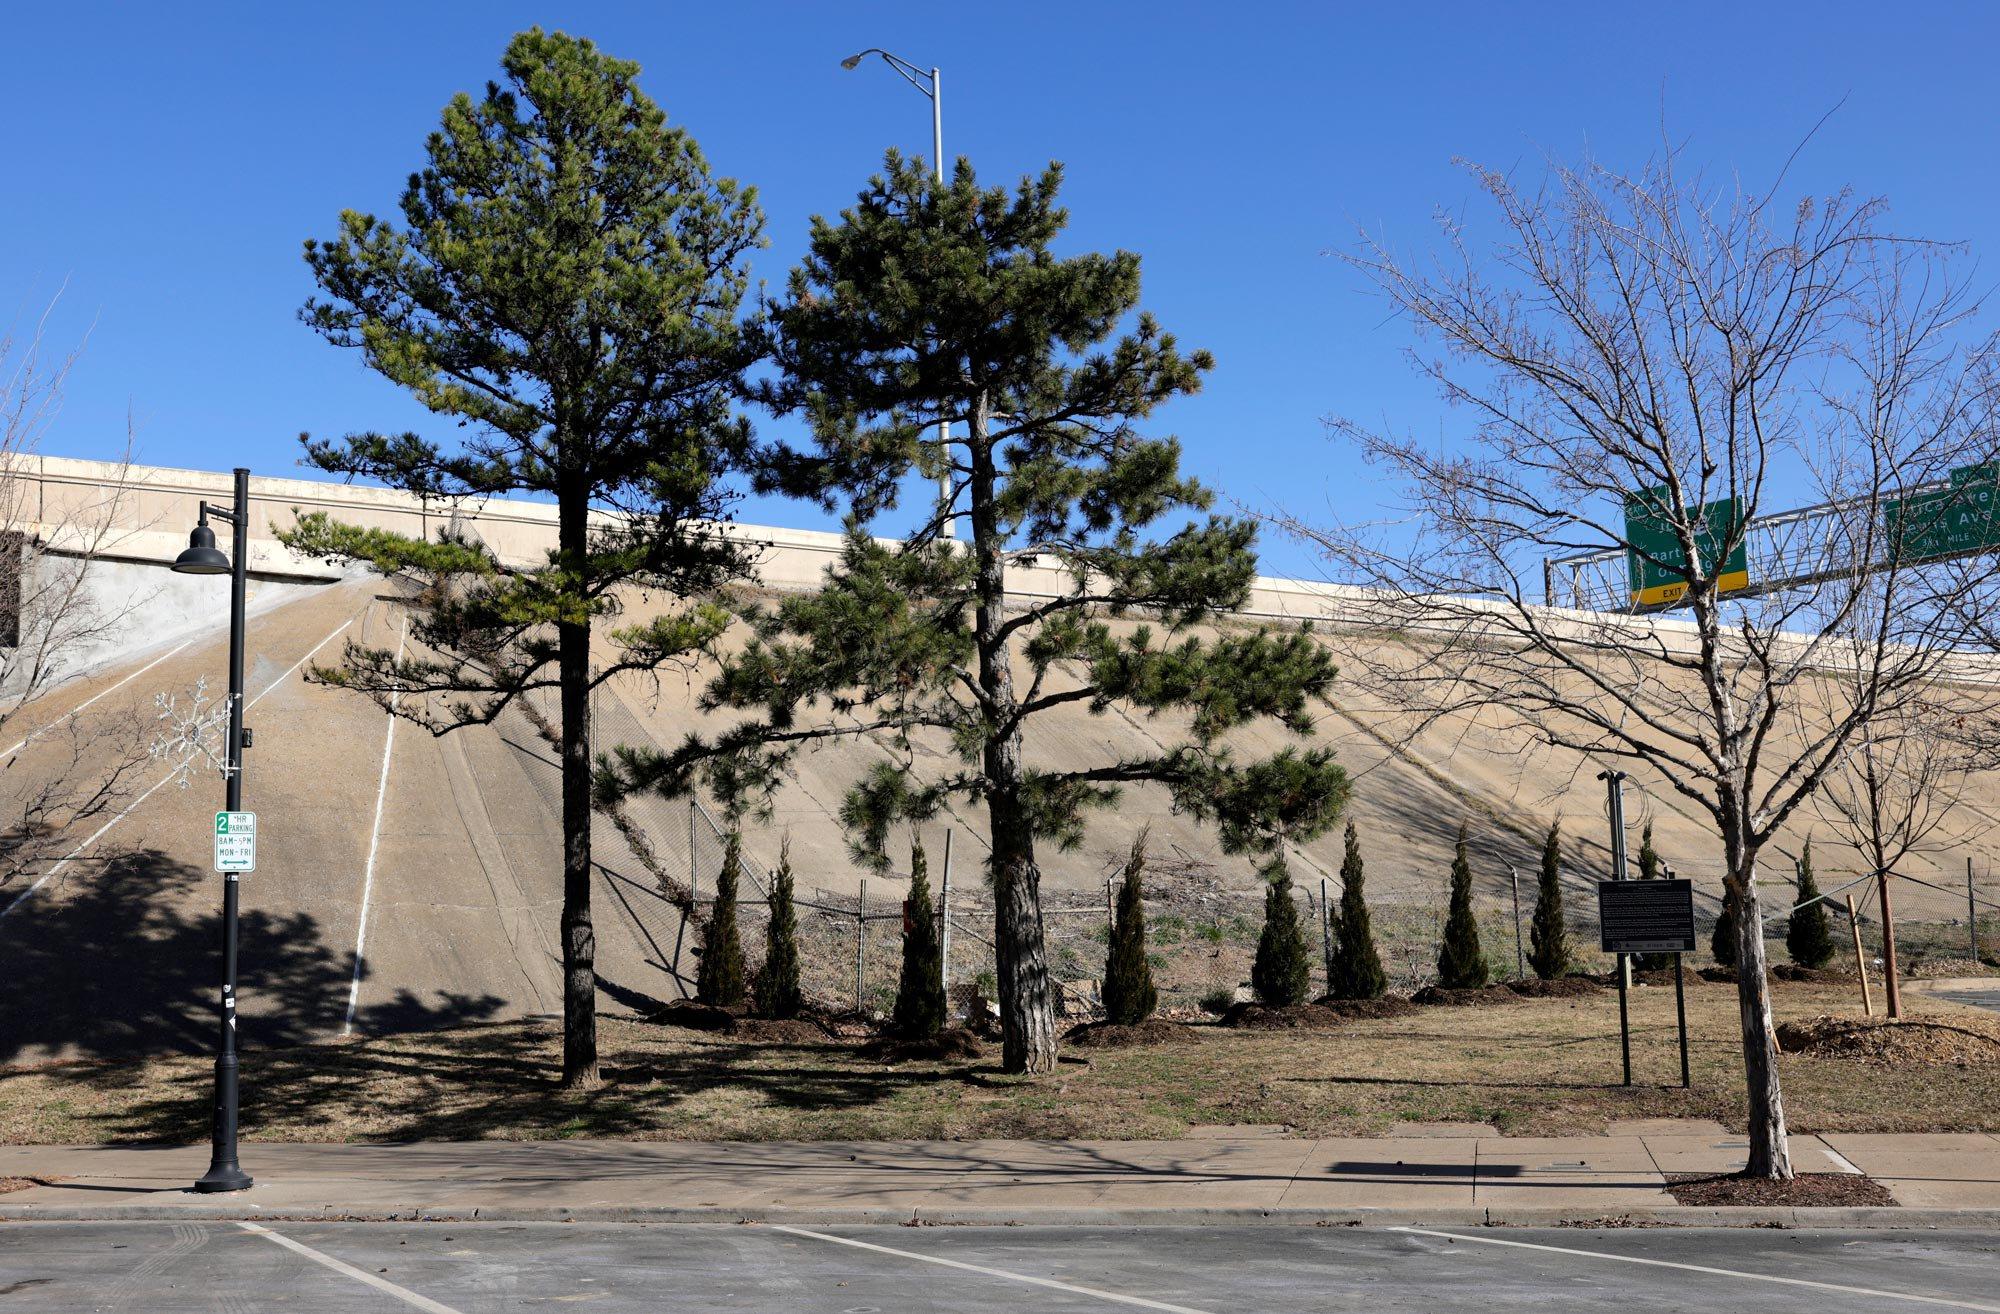 Greenwood-dreamland-theater-Now.jpg